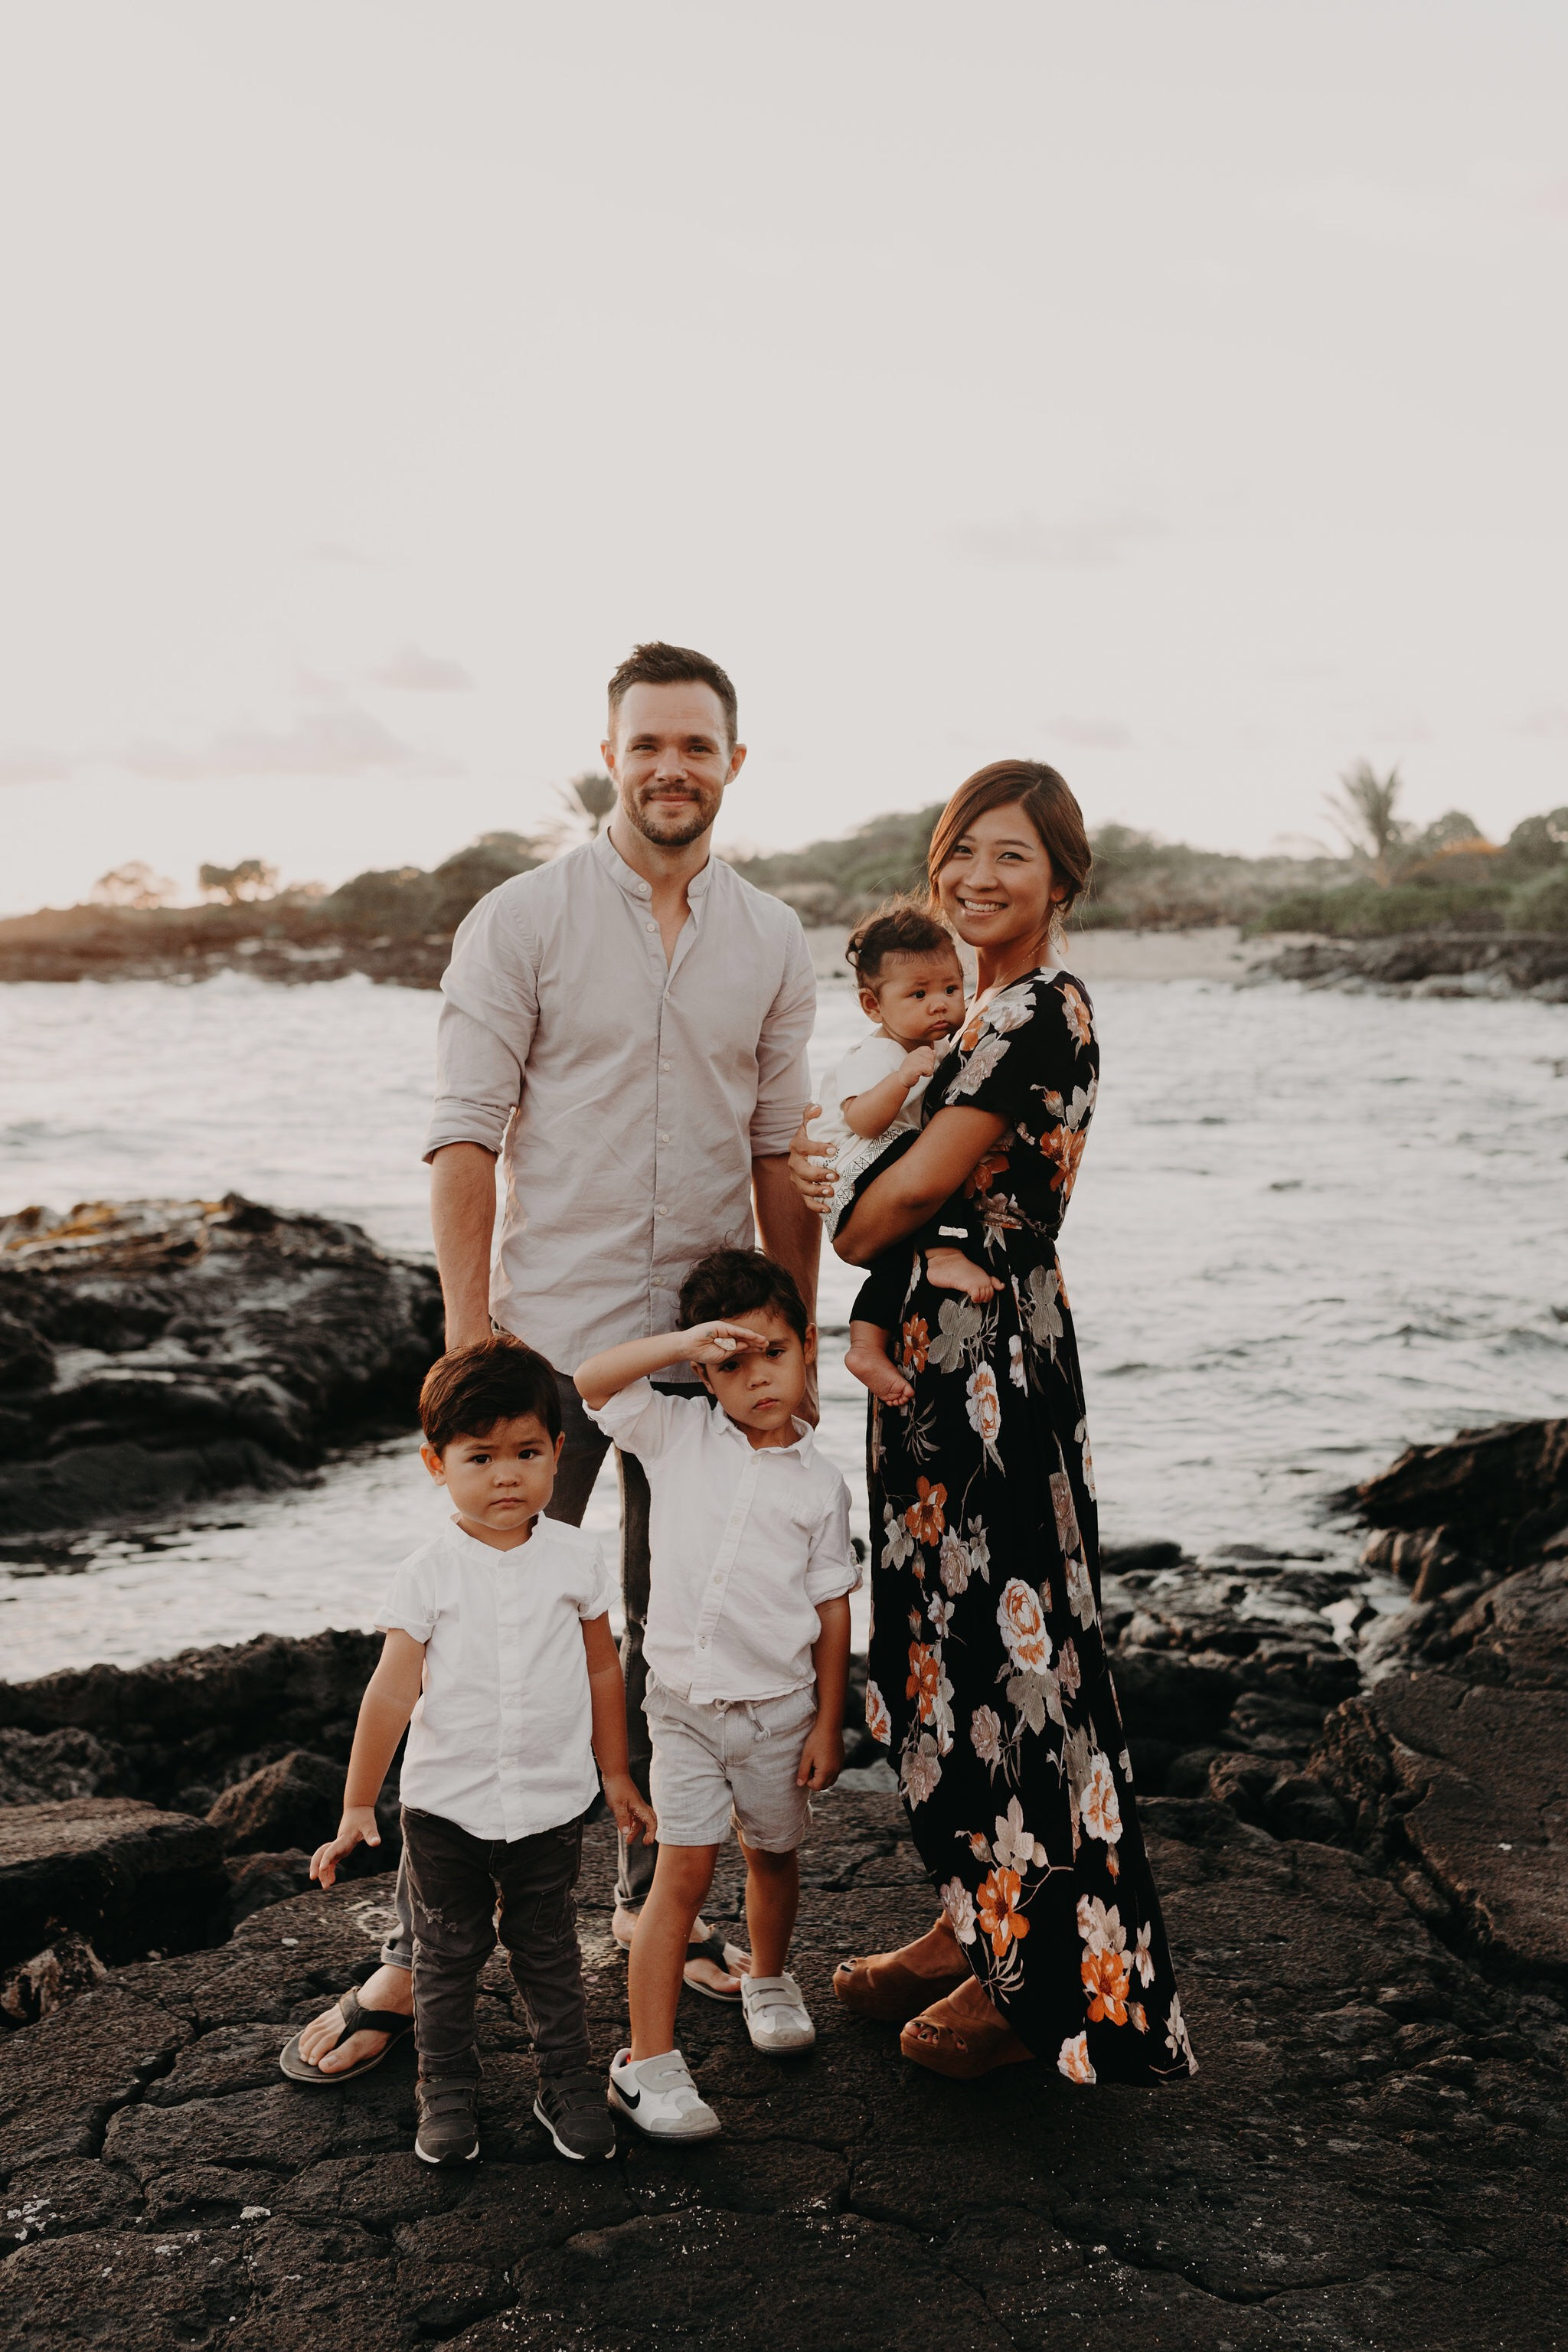 Andrew York | Discipleship Bible School Ministry Leader, YWAM